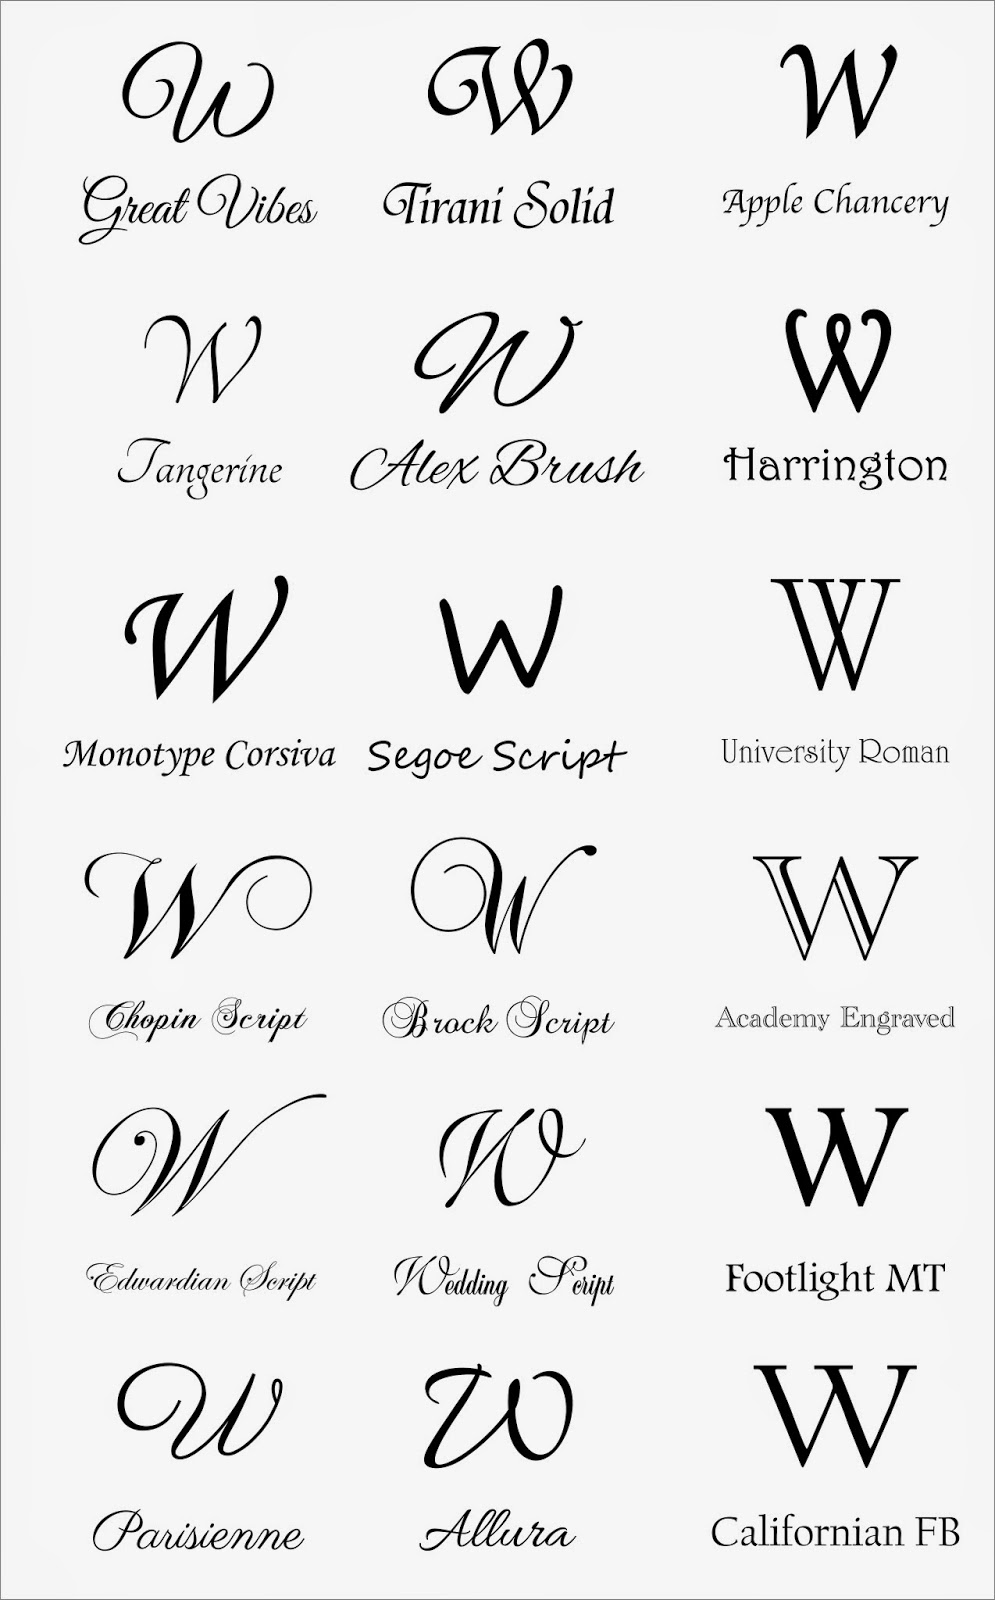 12 Letter W Fonts Images - Different    Lettering Fonts